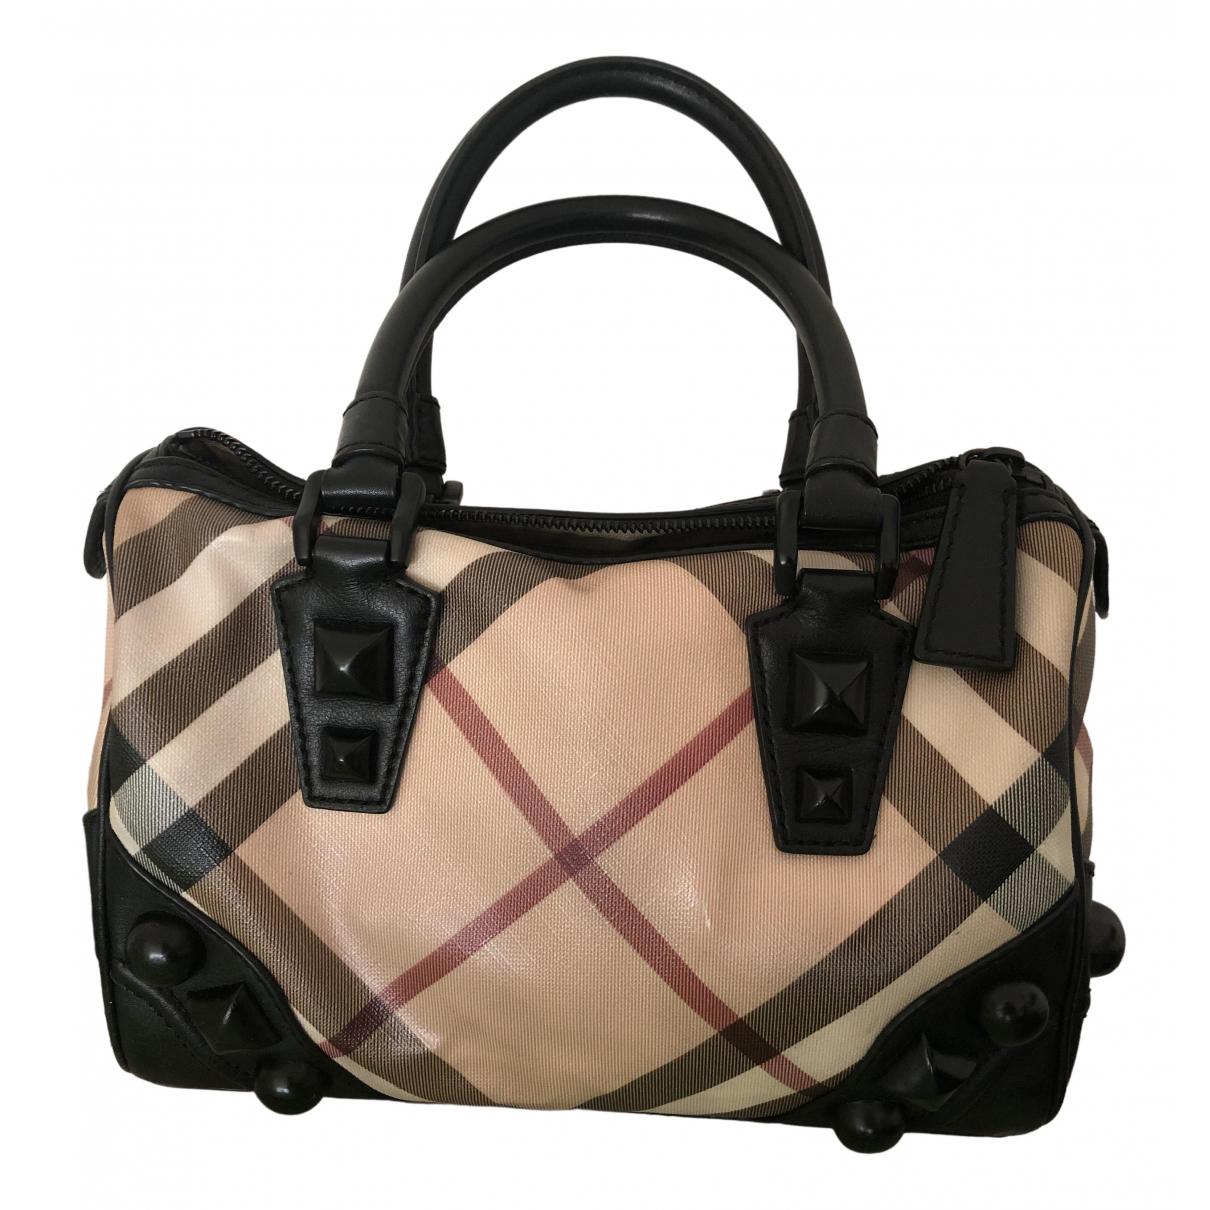 Burberry N Beige Leather handbag for Women N